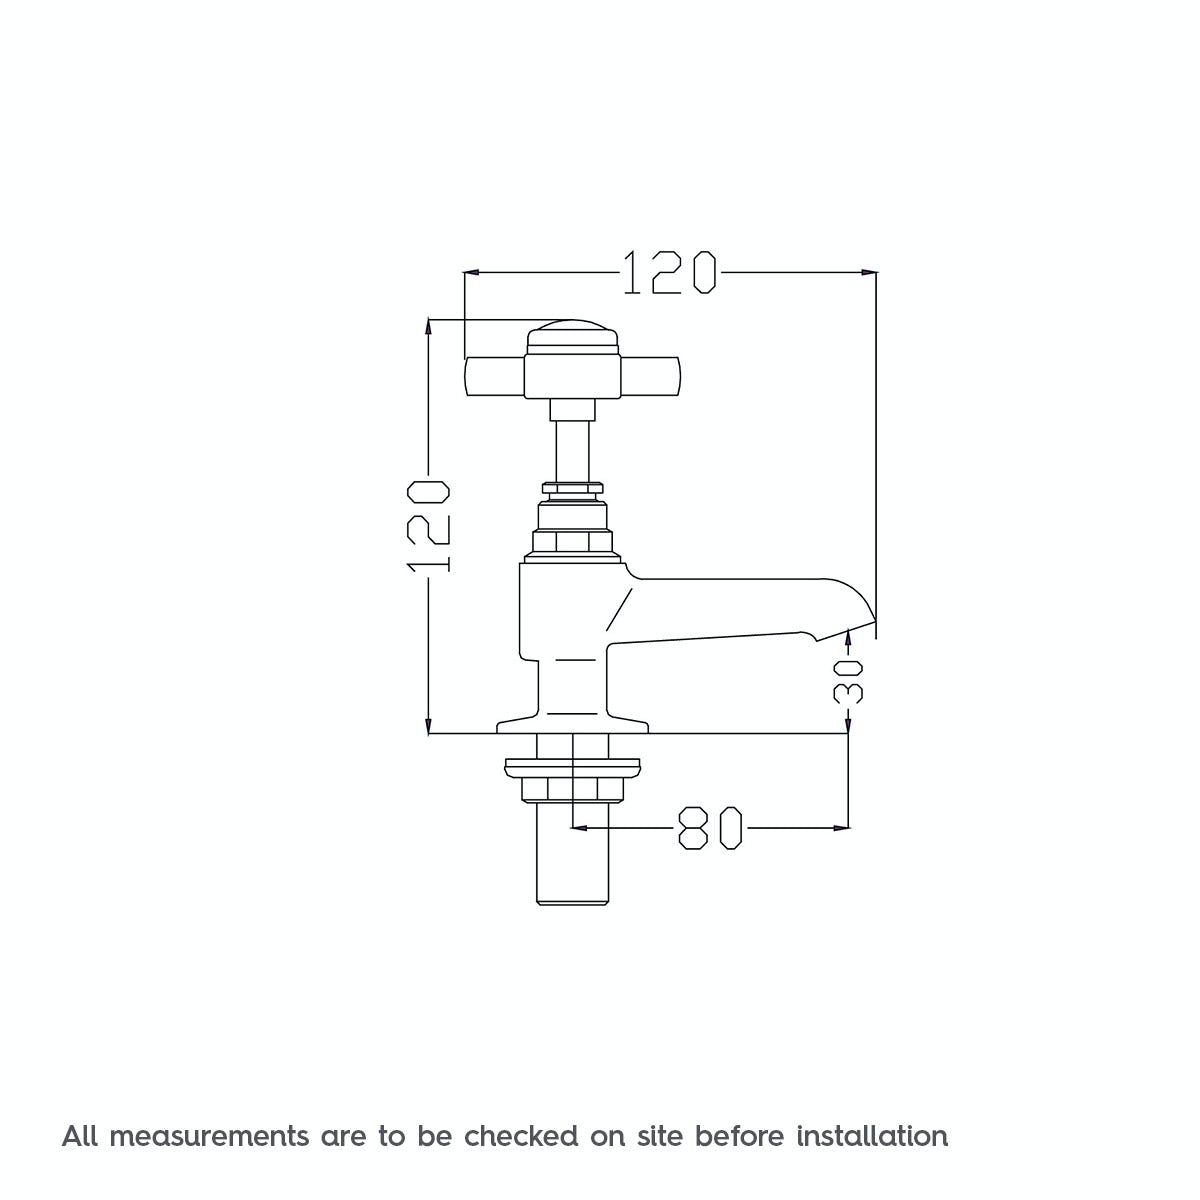 Dimensions for The Bath Co. Dulwich basin pillar taps